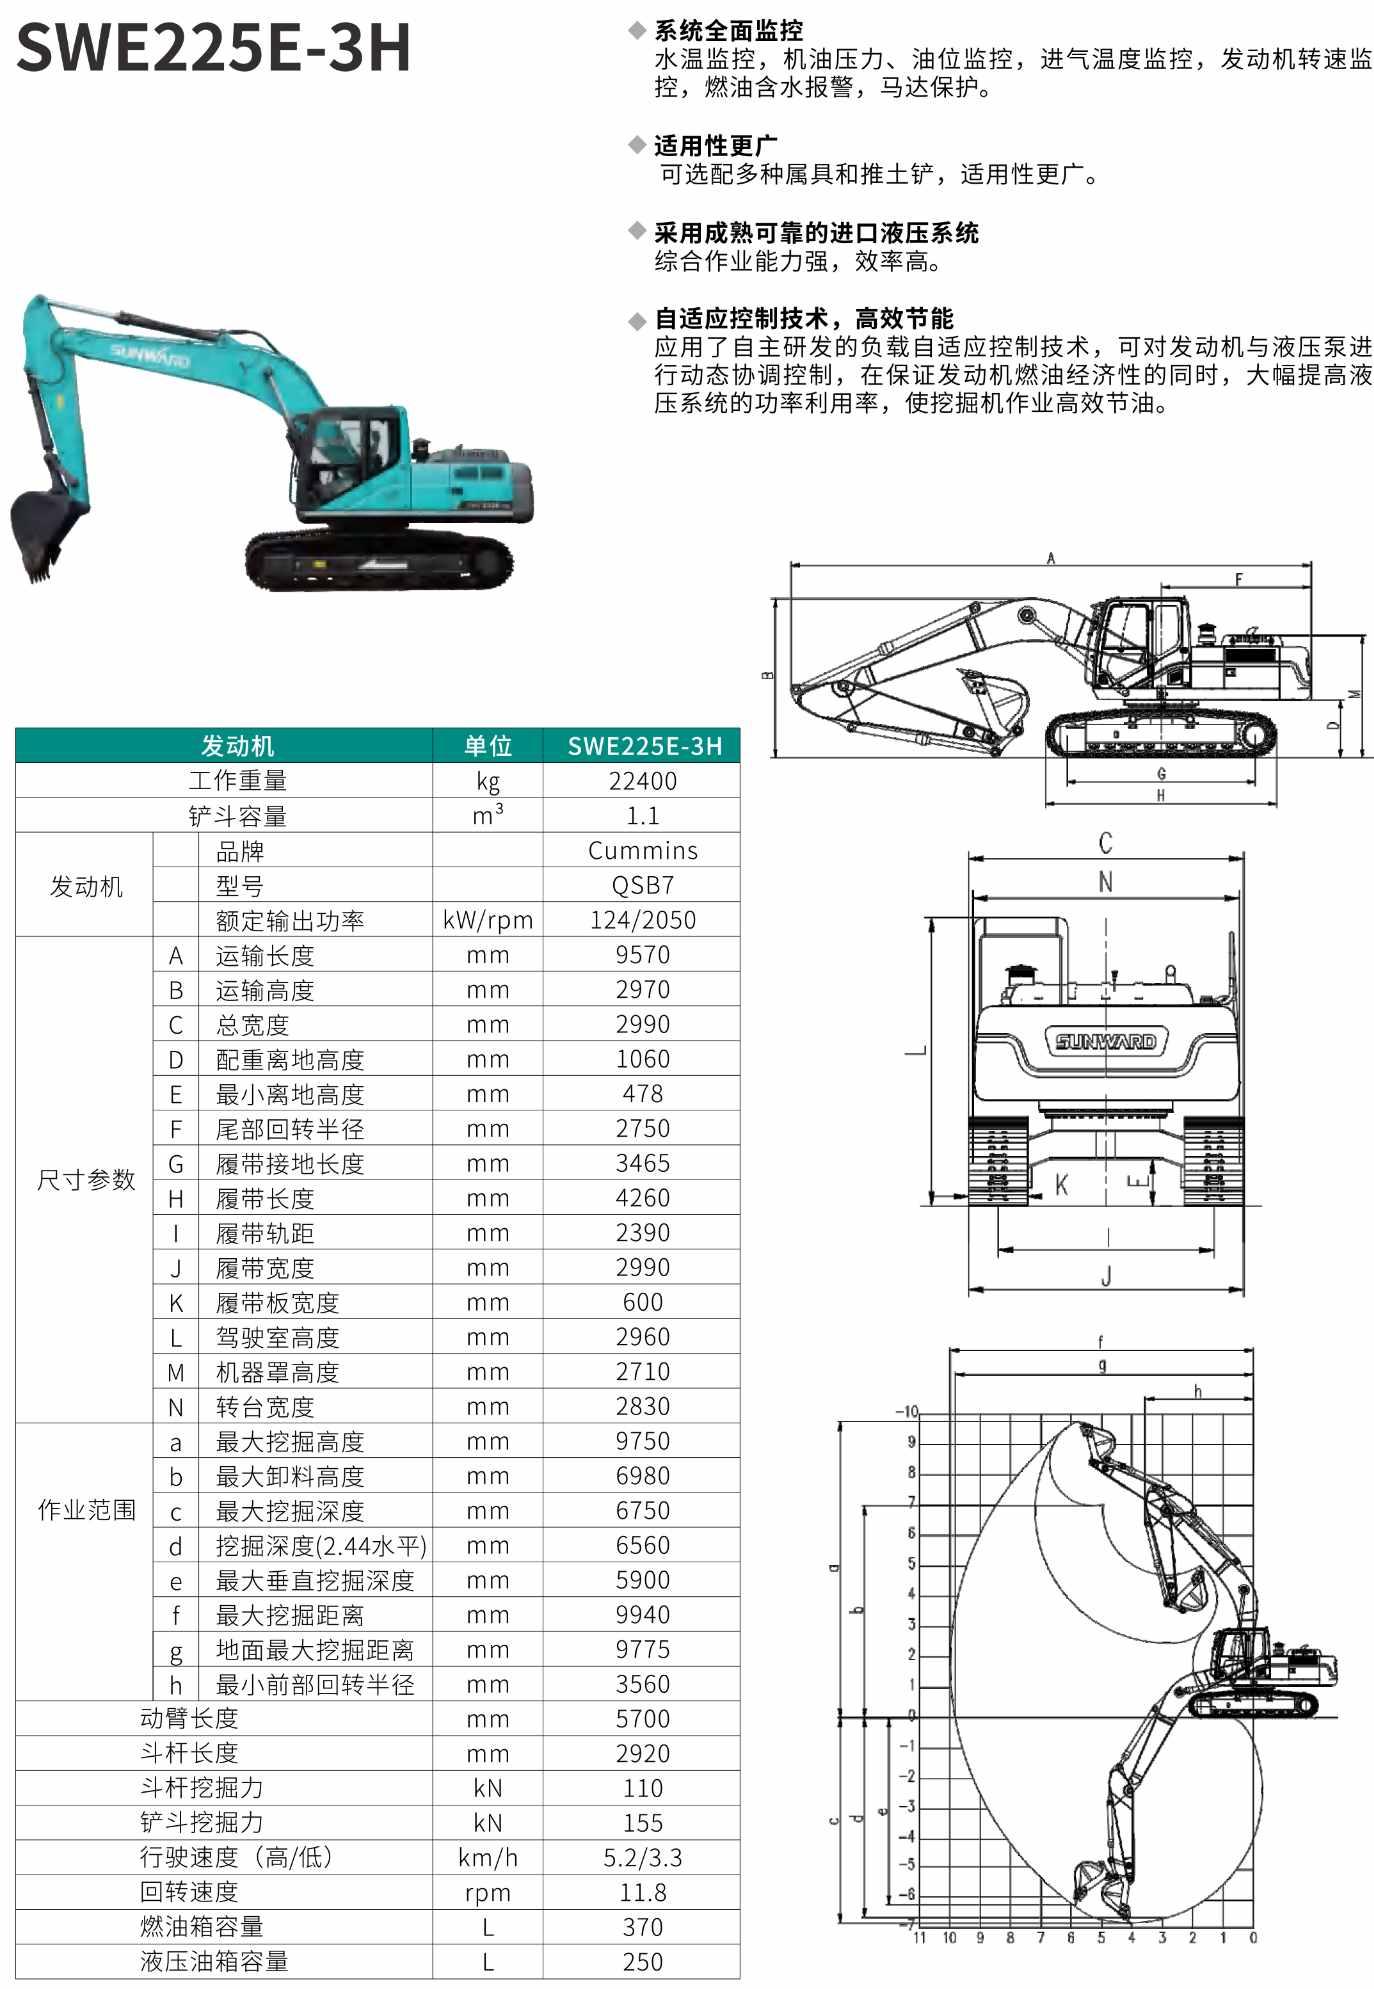 SWE225E-3H 中型挖掘机